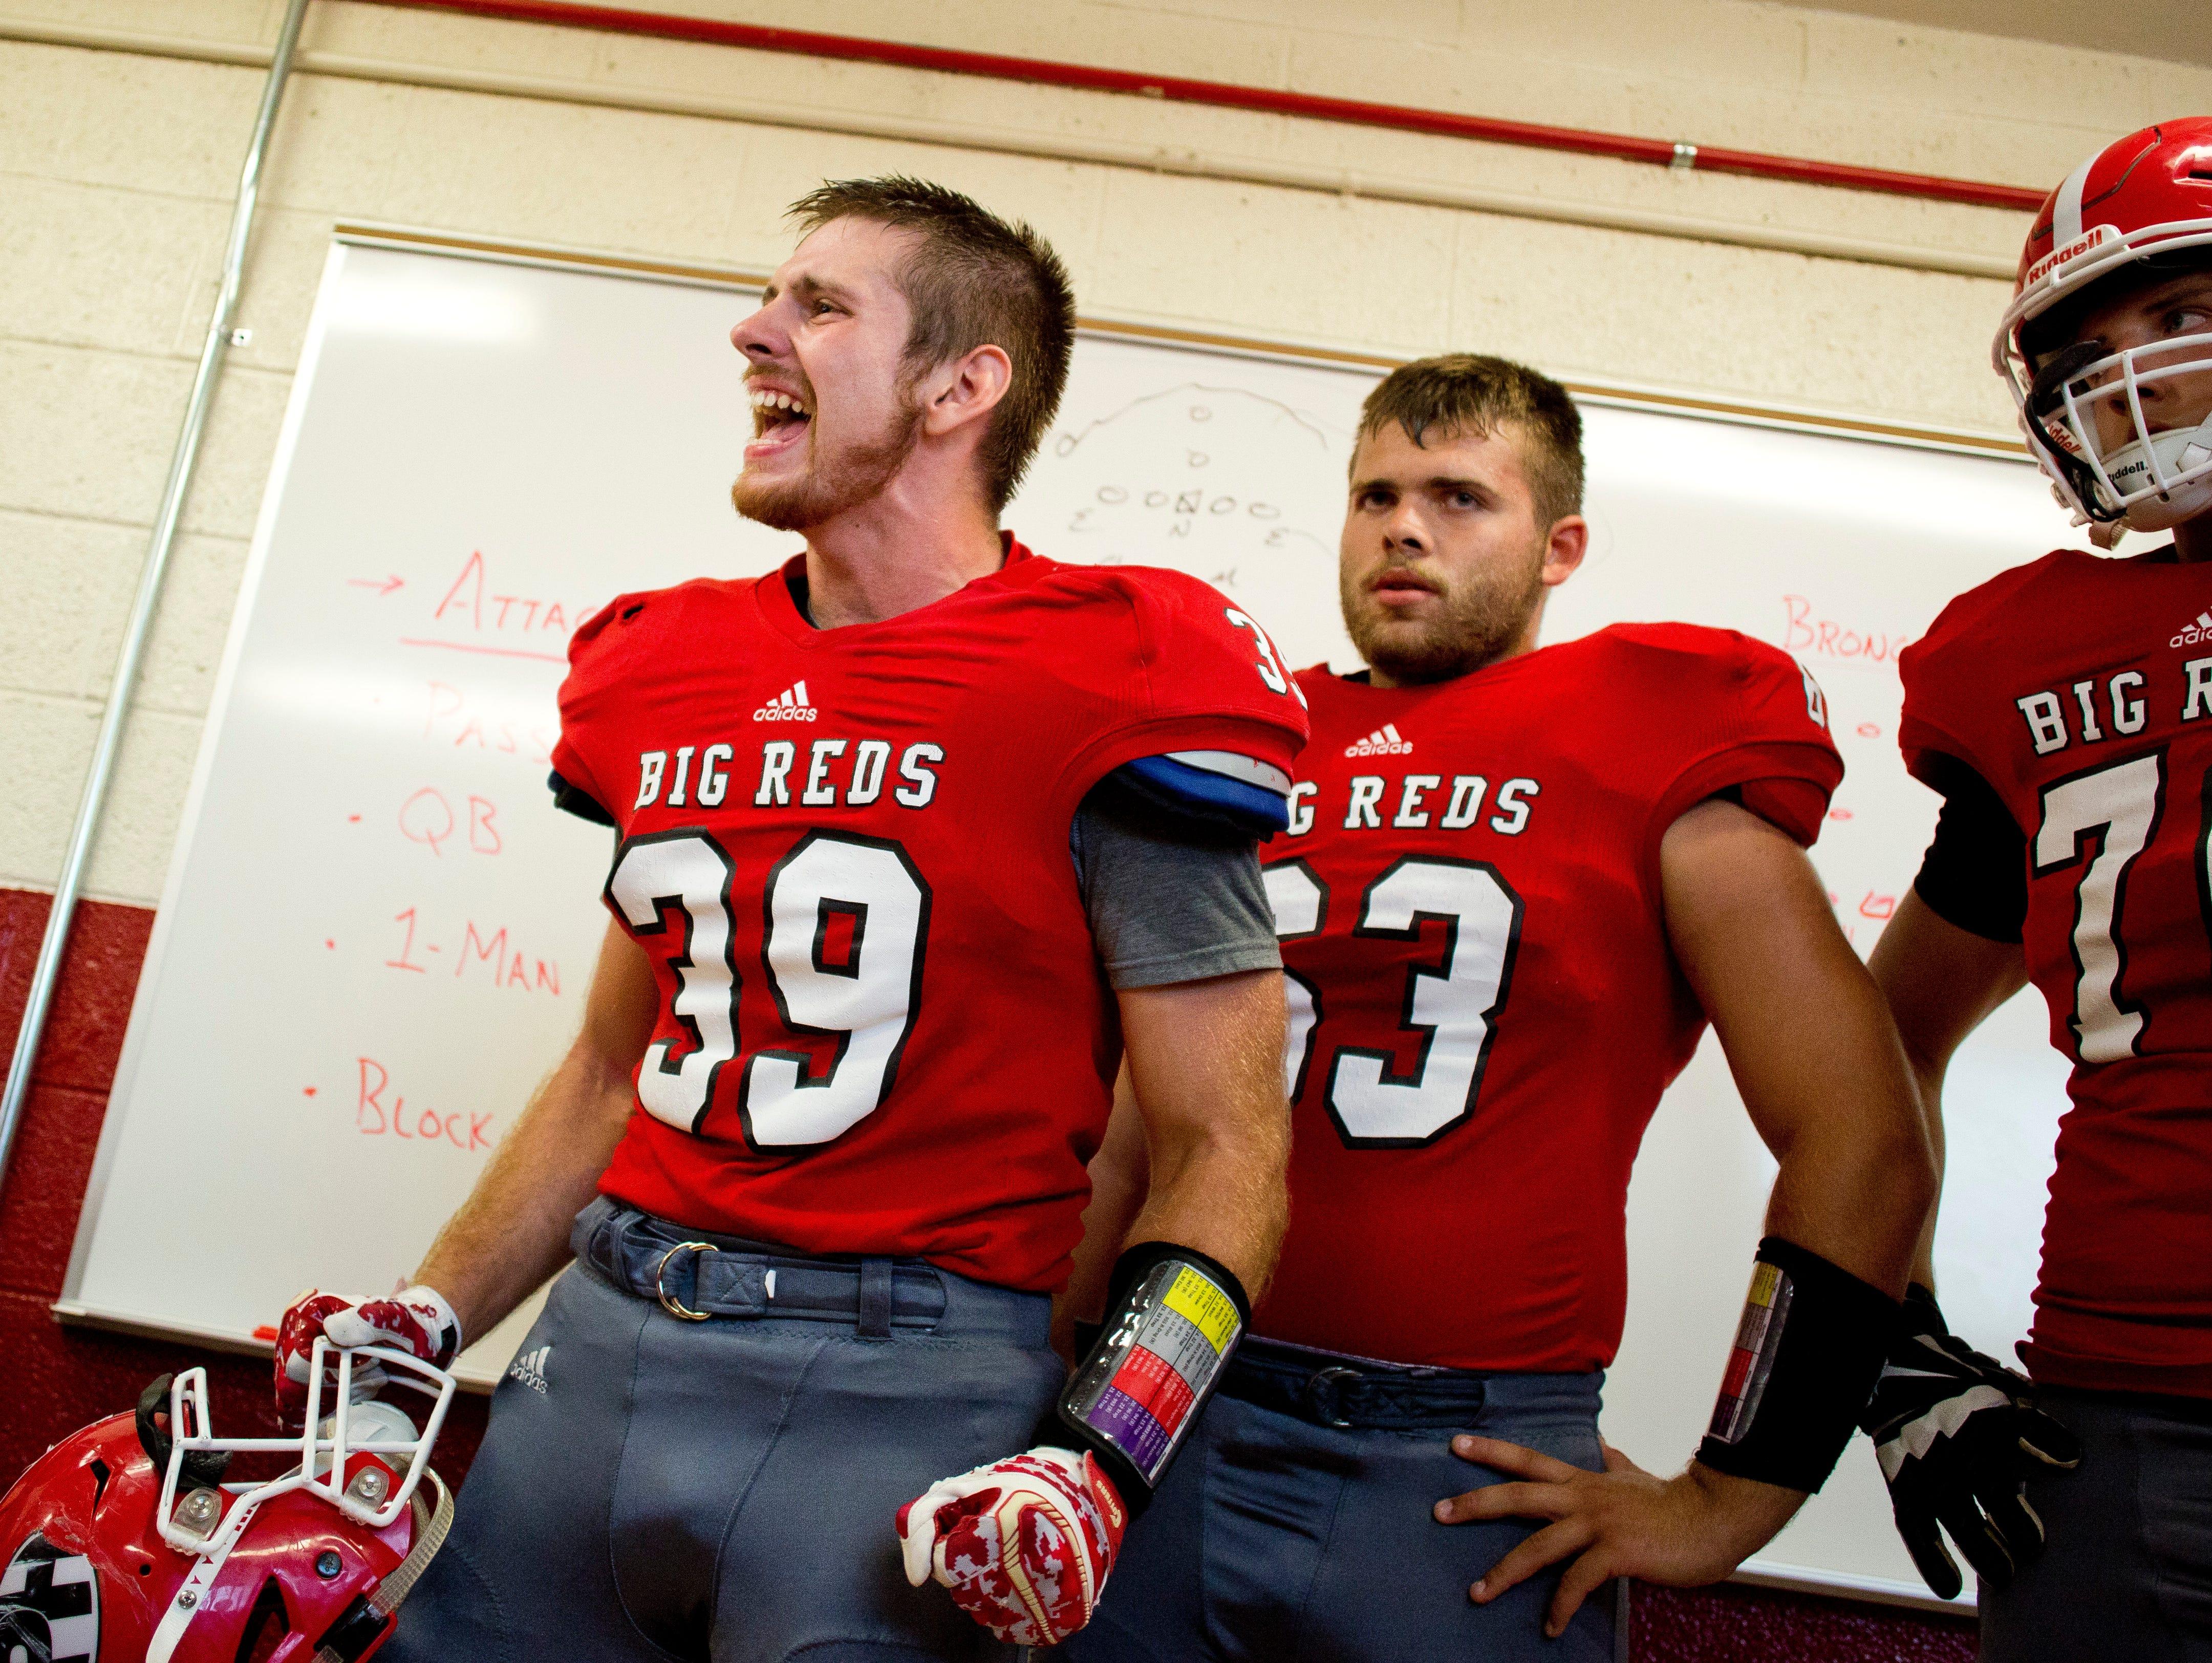 Port Huron senior Devon Lynch hypes up his teammates in the locker room during a football game Friday, September 25, 2015 at Memorial Stadium in Port Huron.